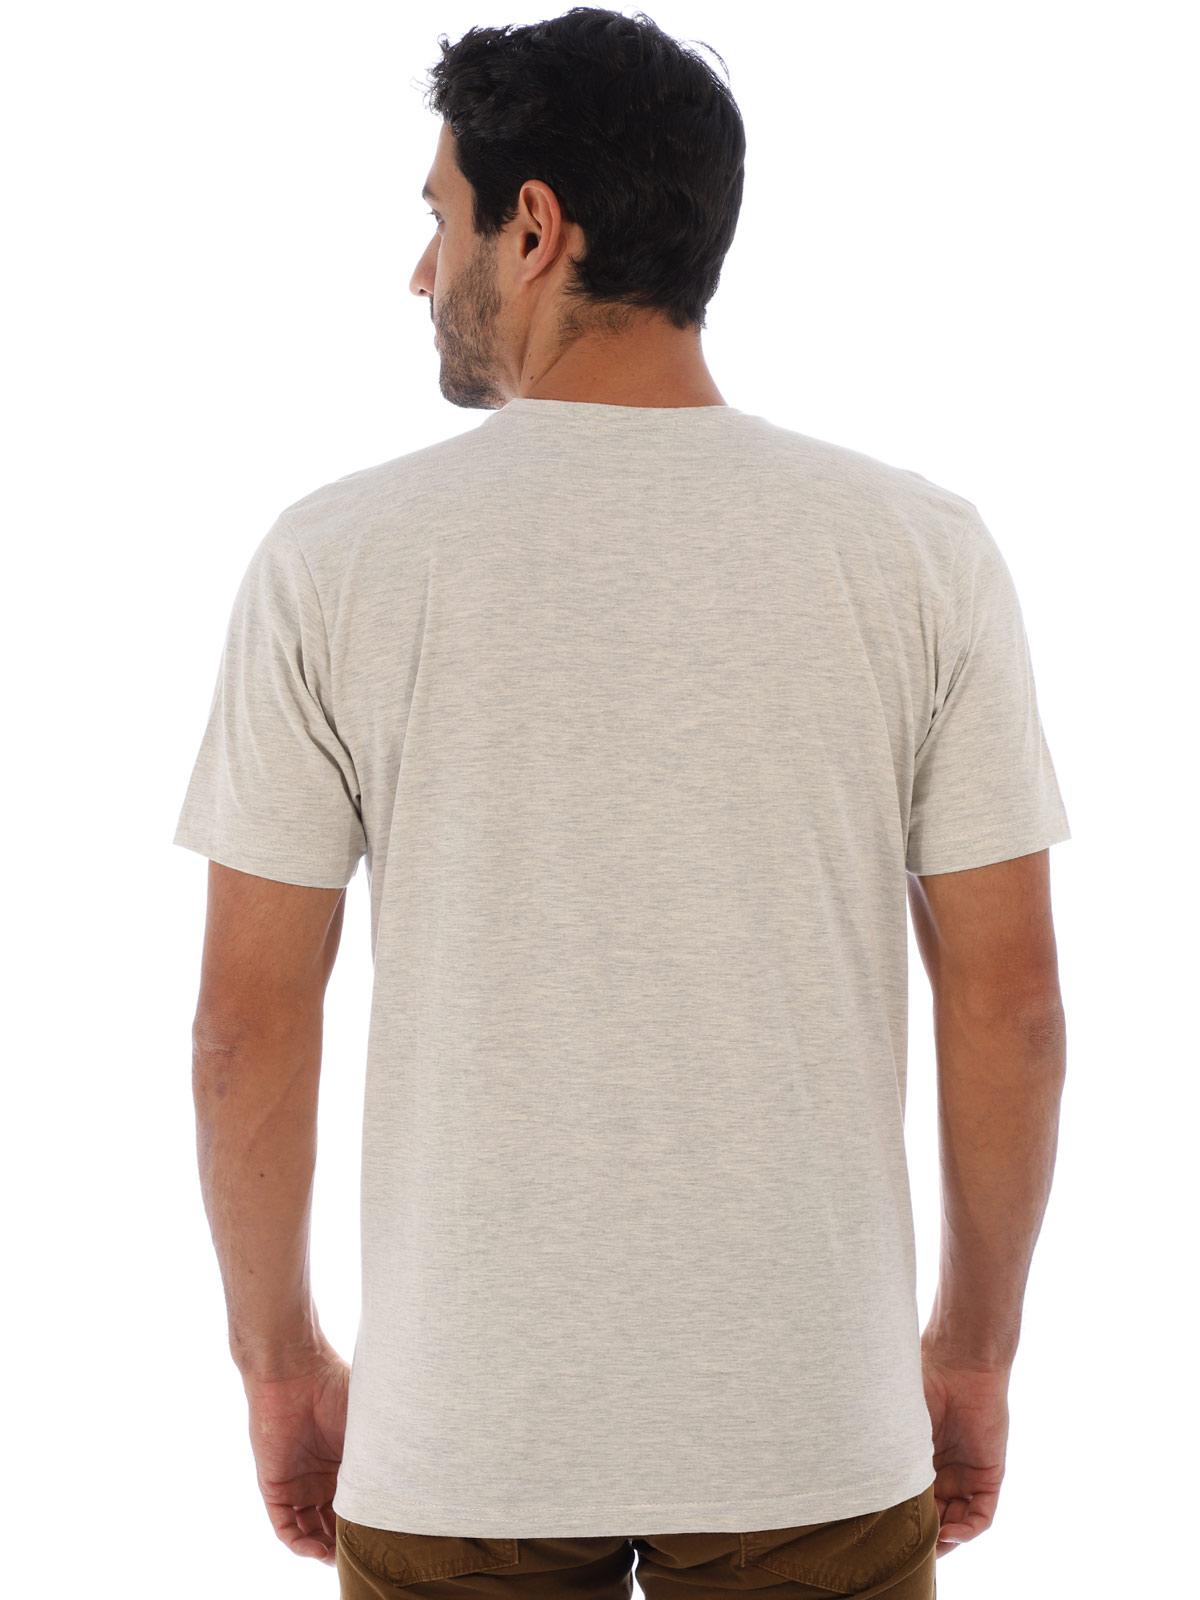 Camiseta Masculina Básica Algodão Estampa Ingredients Mescla